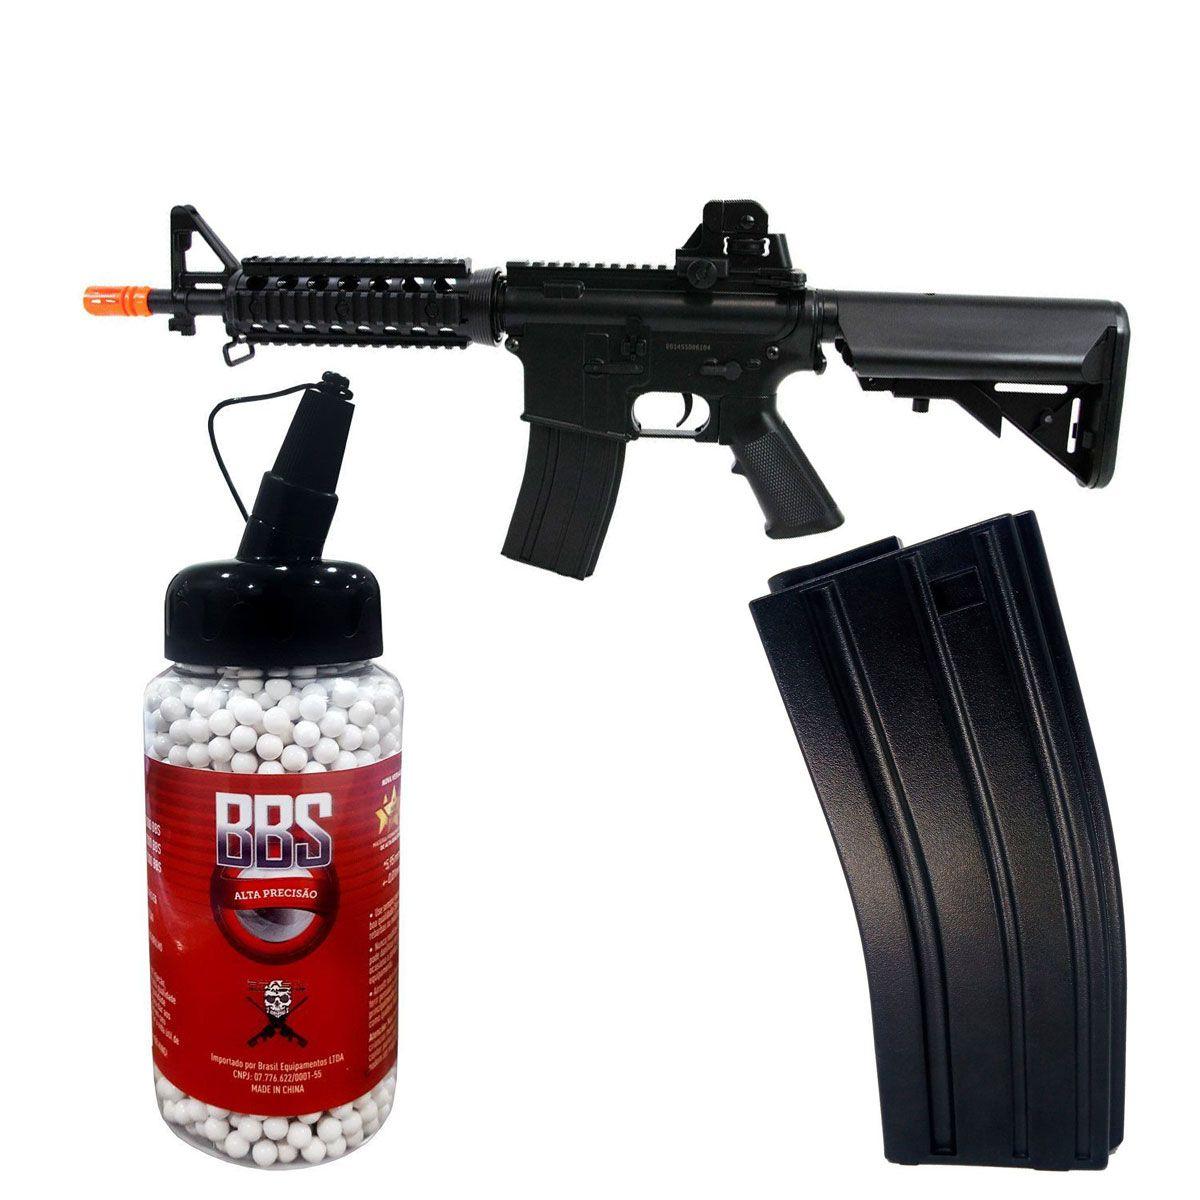 Kit Rifle Cyma + BB King 0,20 + Magazine Extra